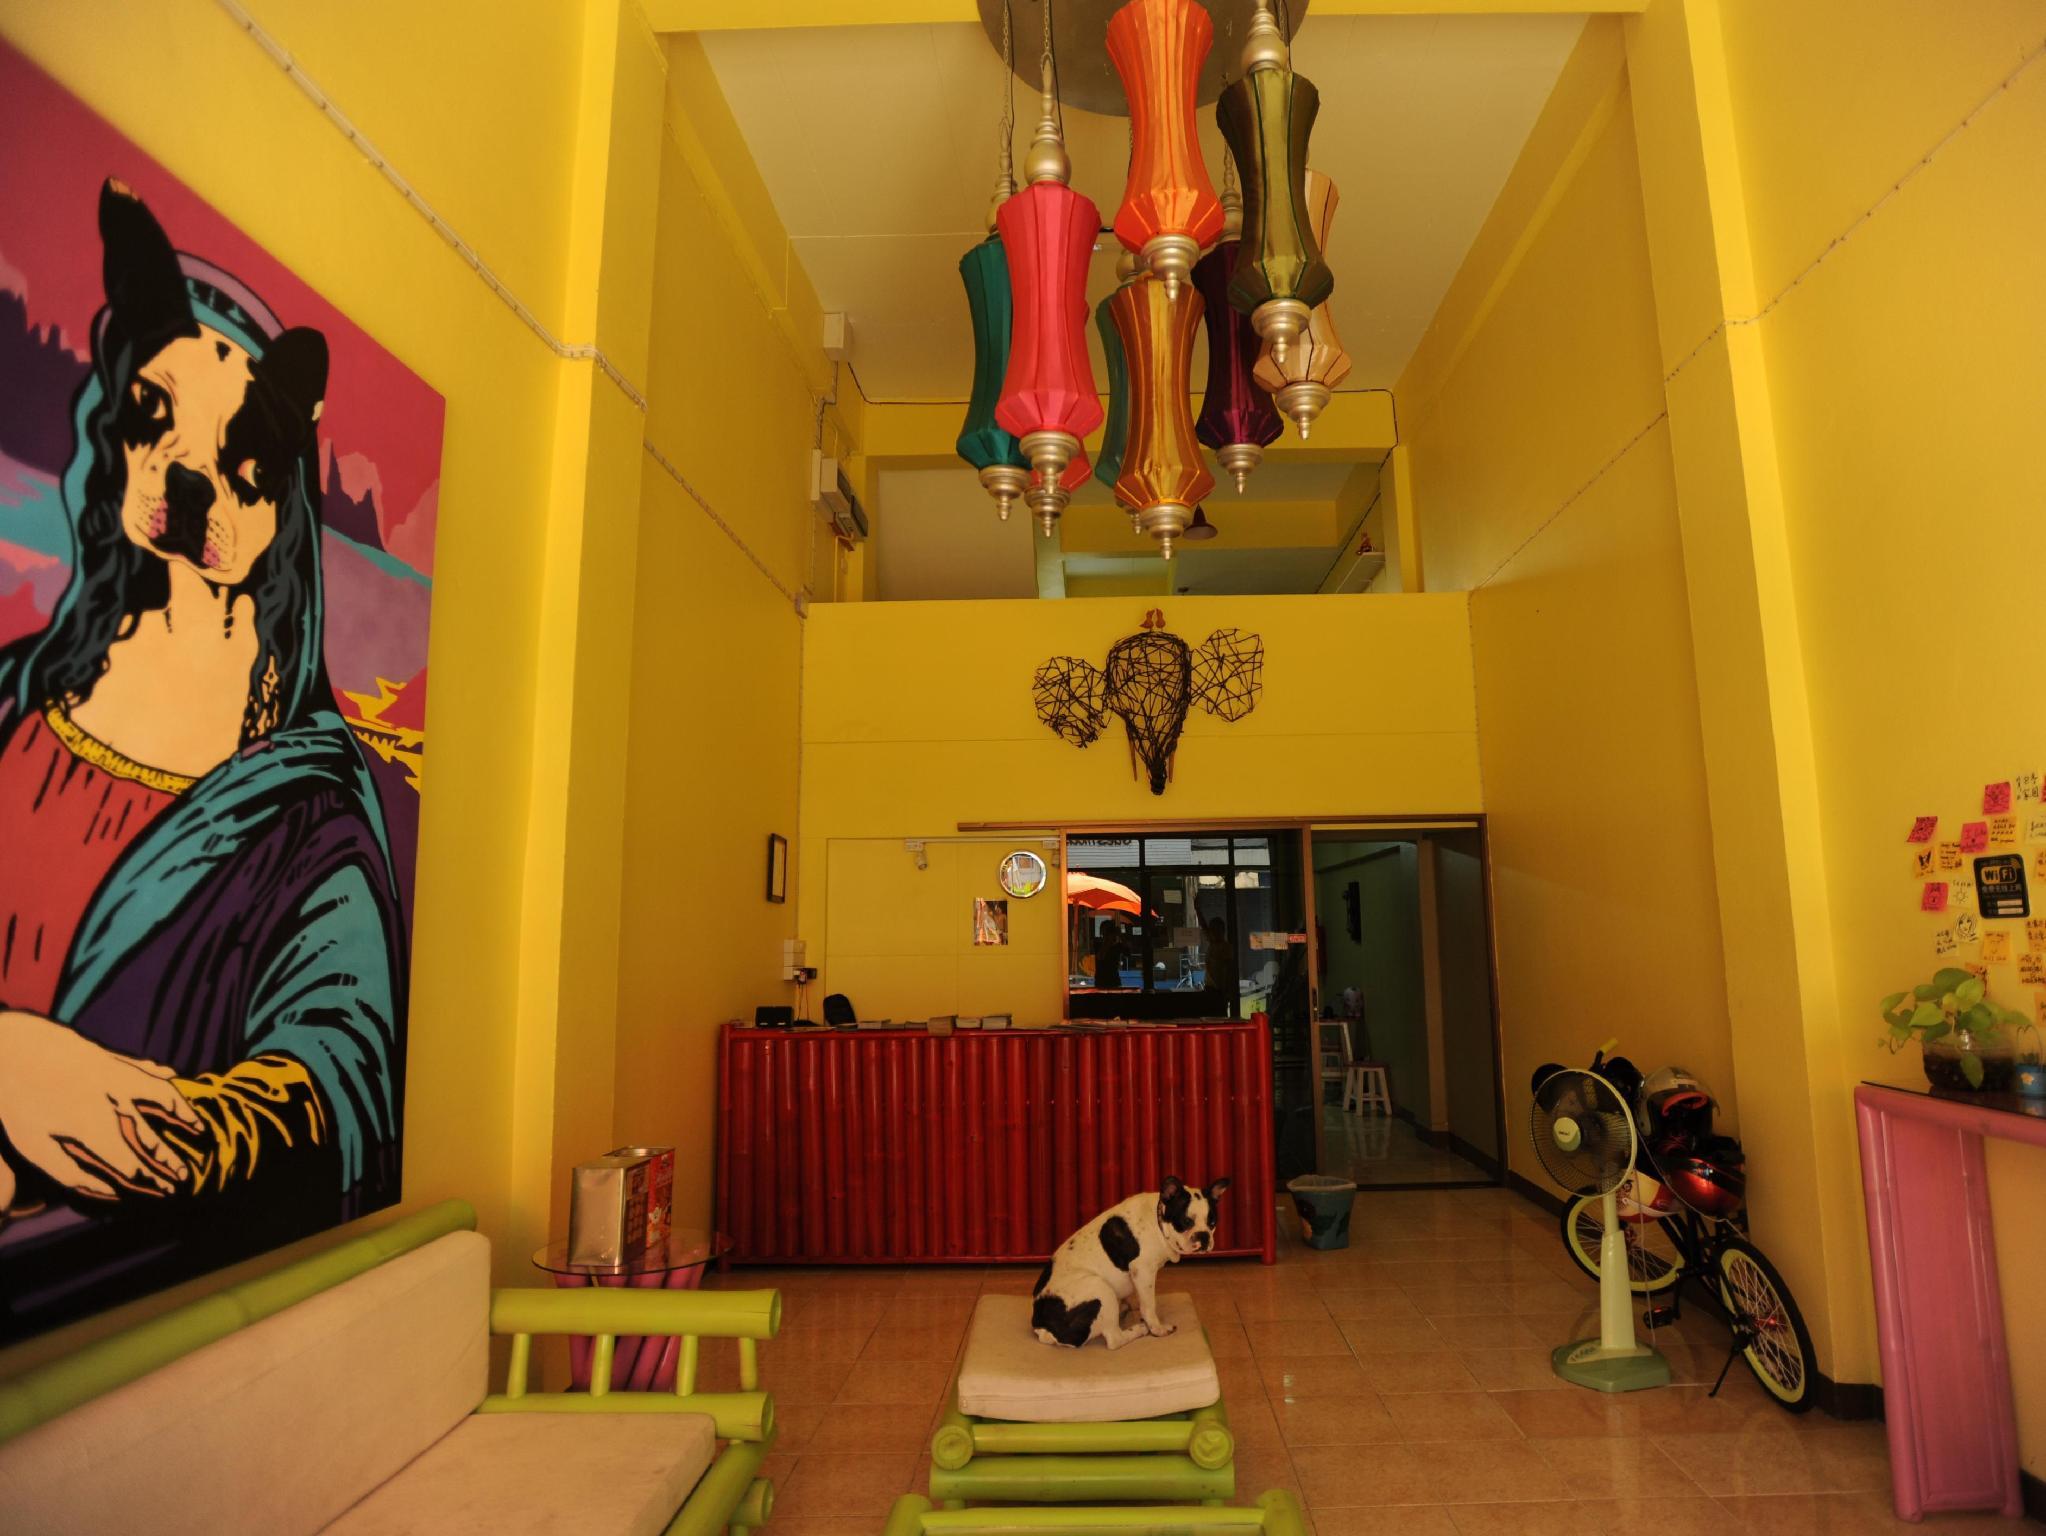 Mueang Mueang Inn,เมืองเมือง อินน์